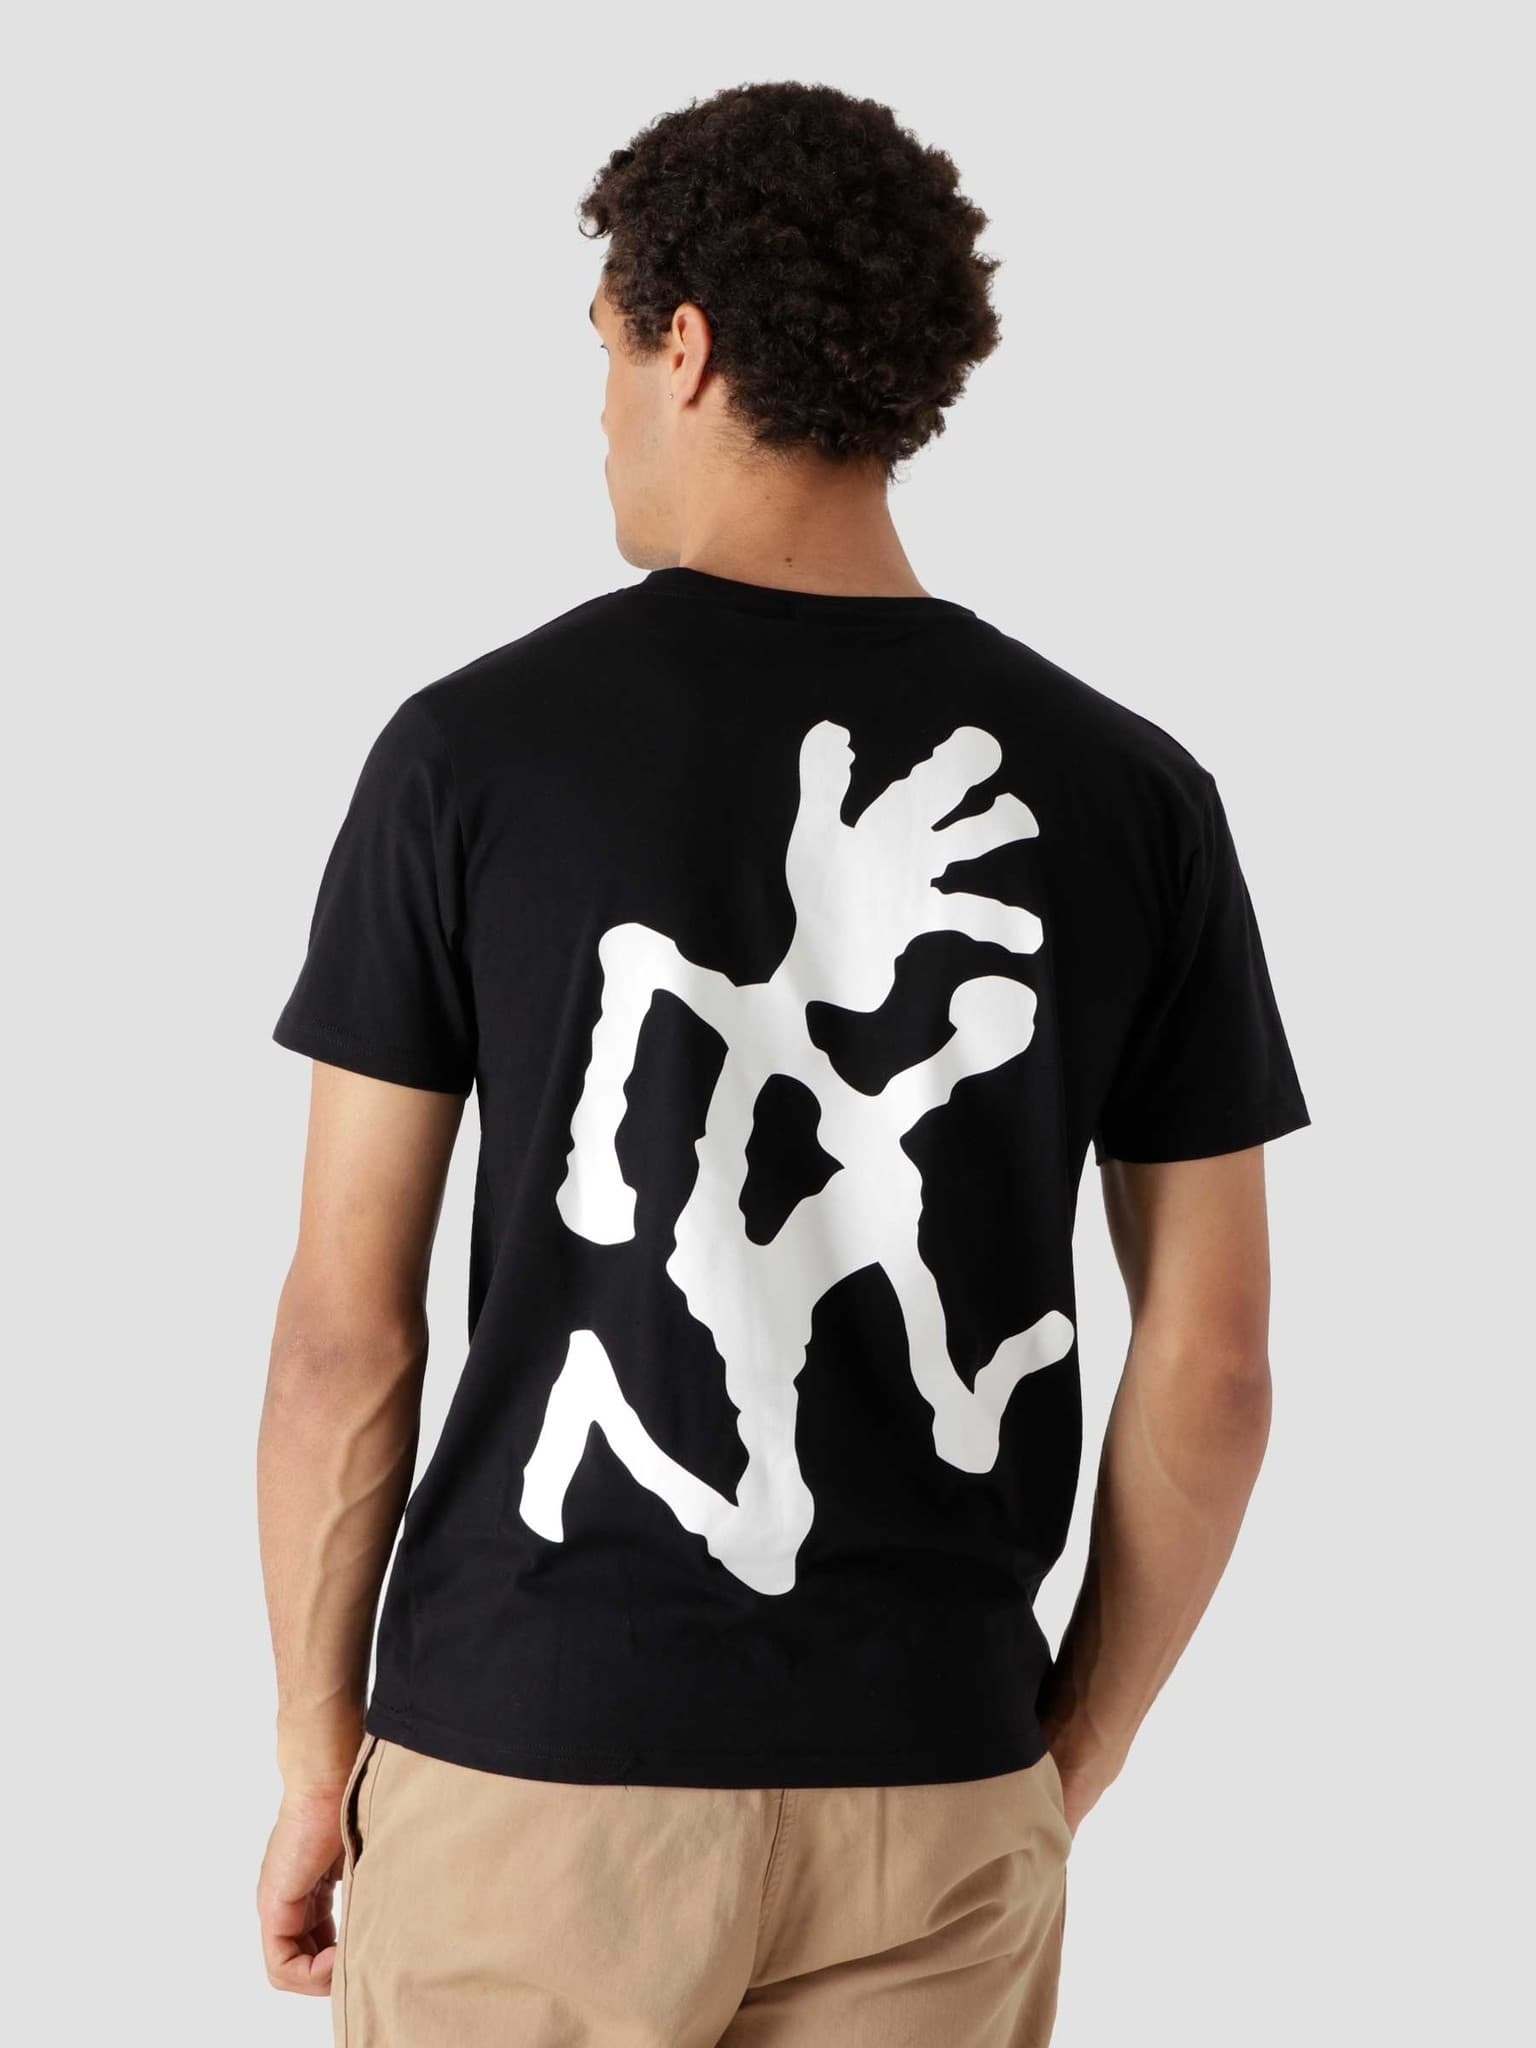 Big Runningman T-Shirt Black 2013-STS